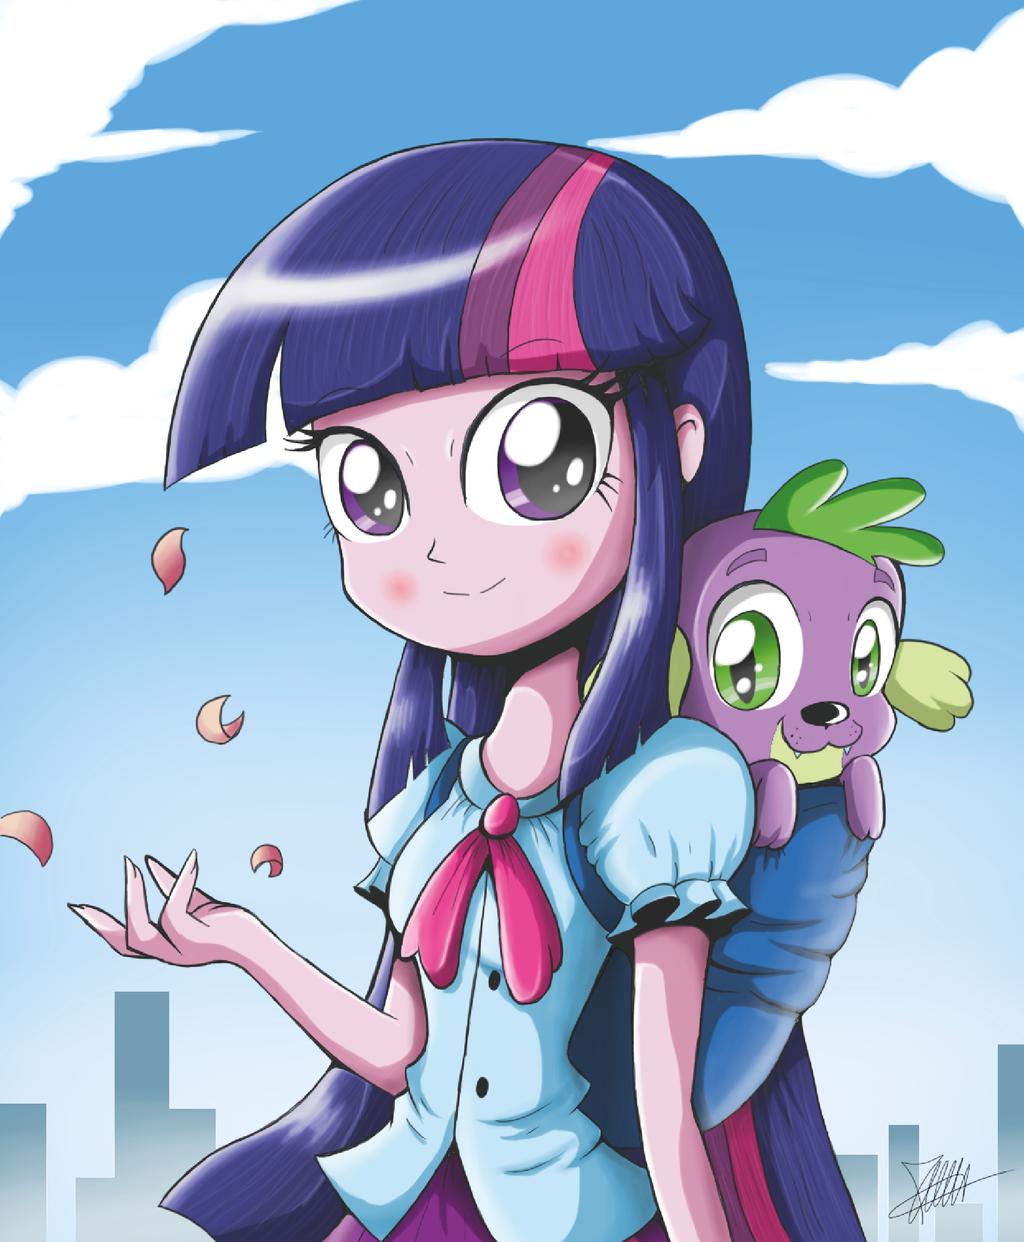 .:Human Pony 9:. by The-Butcher-X on DeviantArt